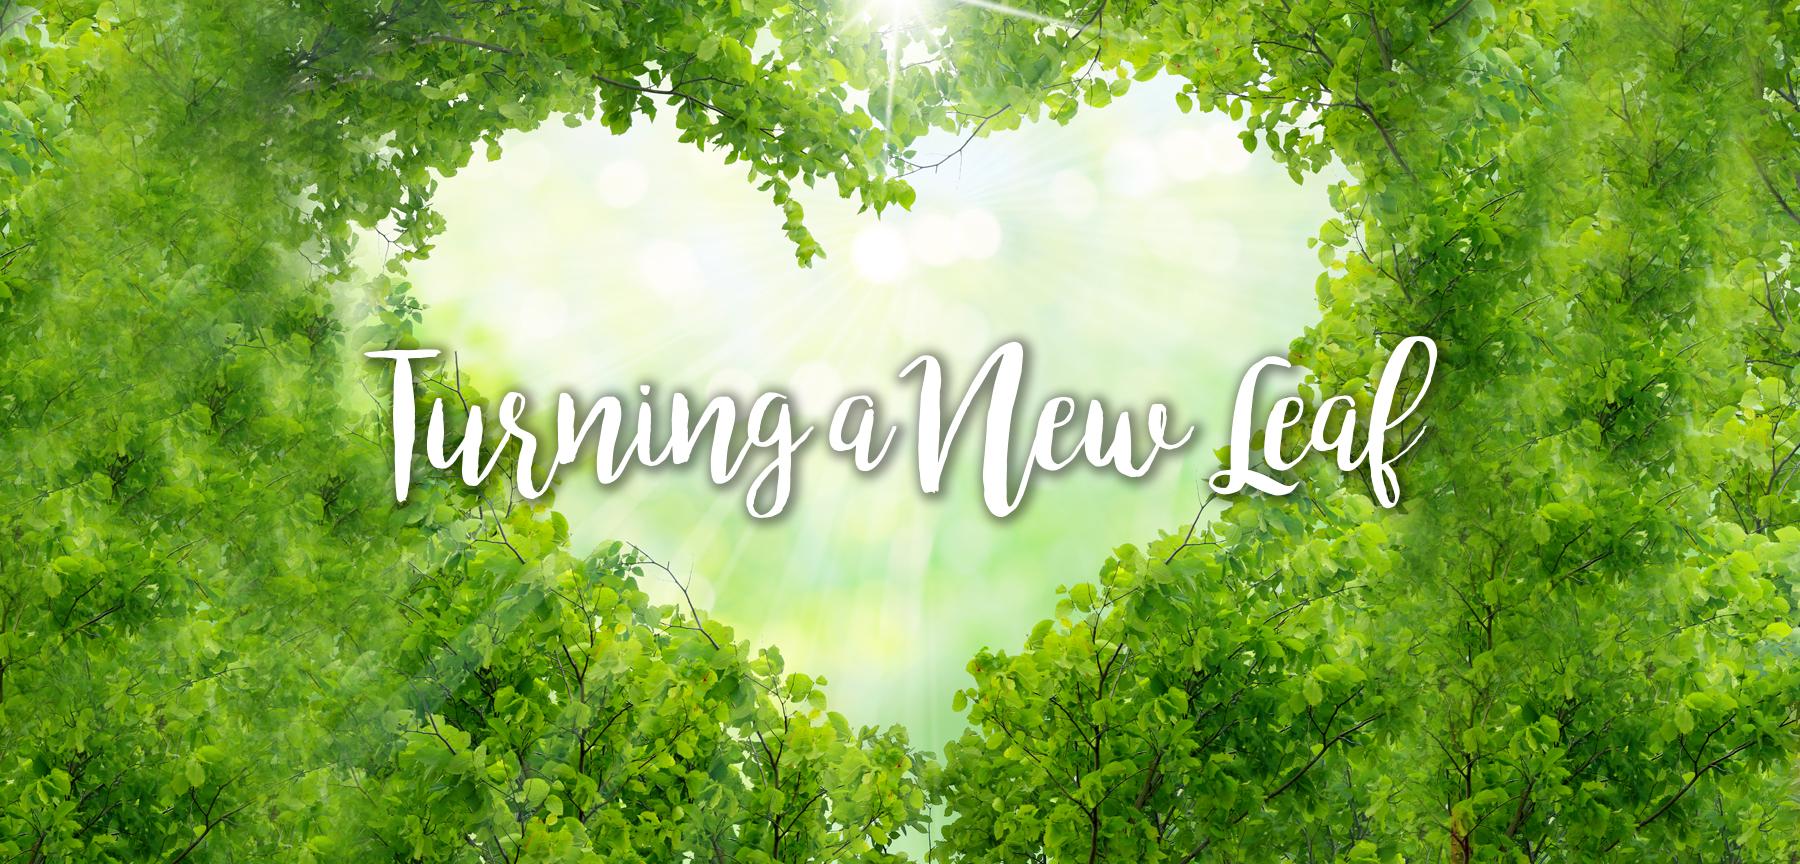 Turning a New Leaf banner.jpg